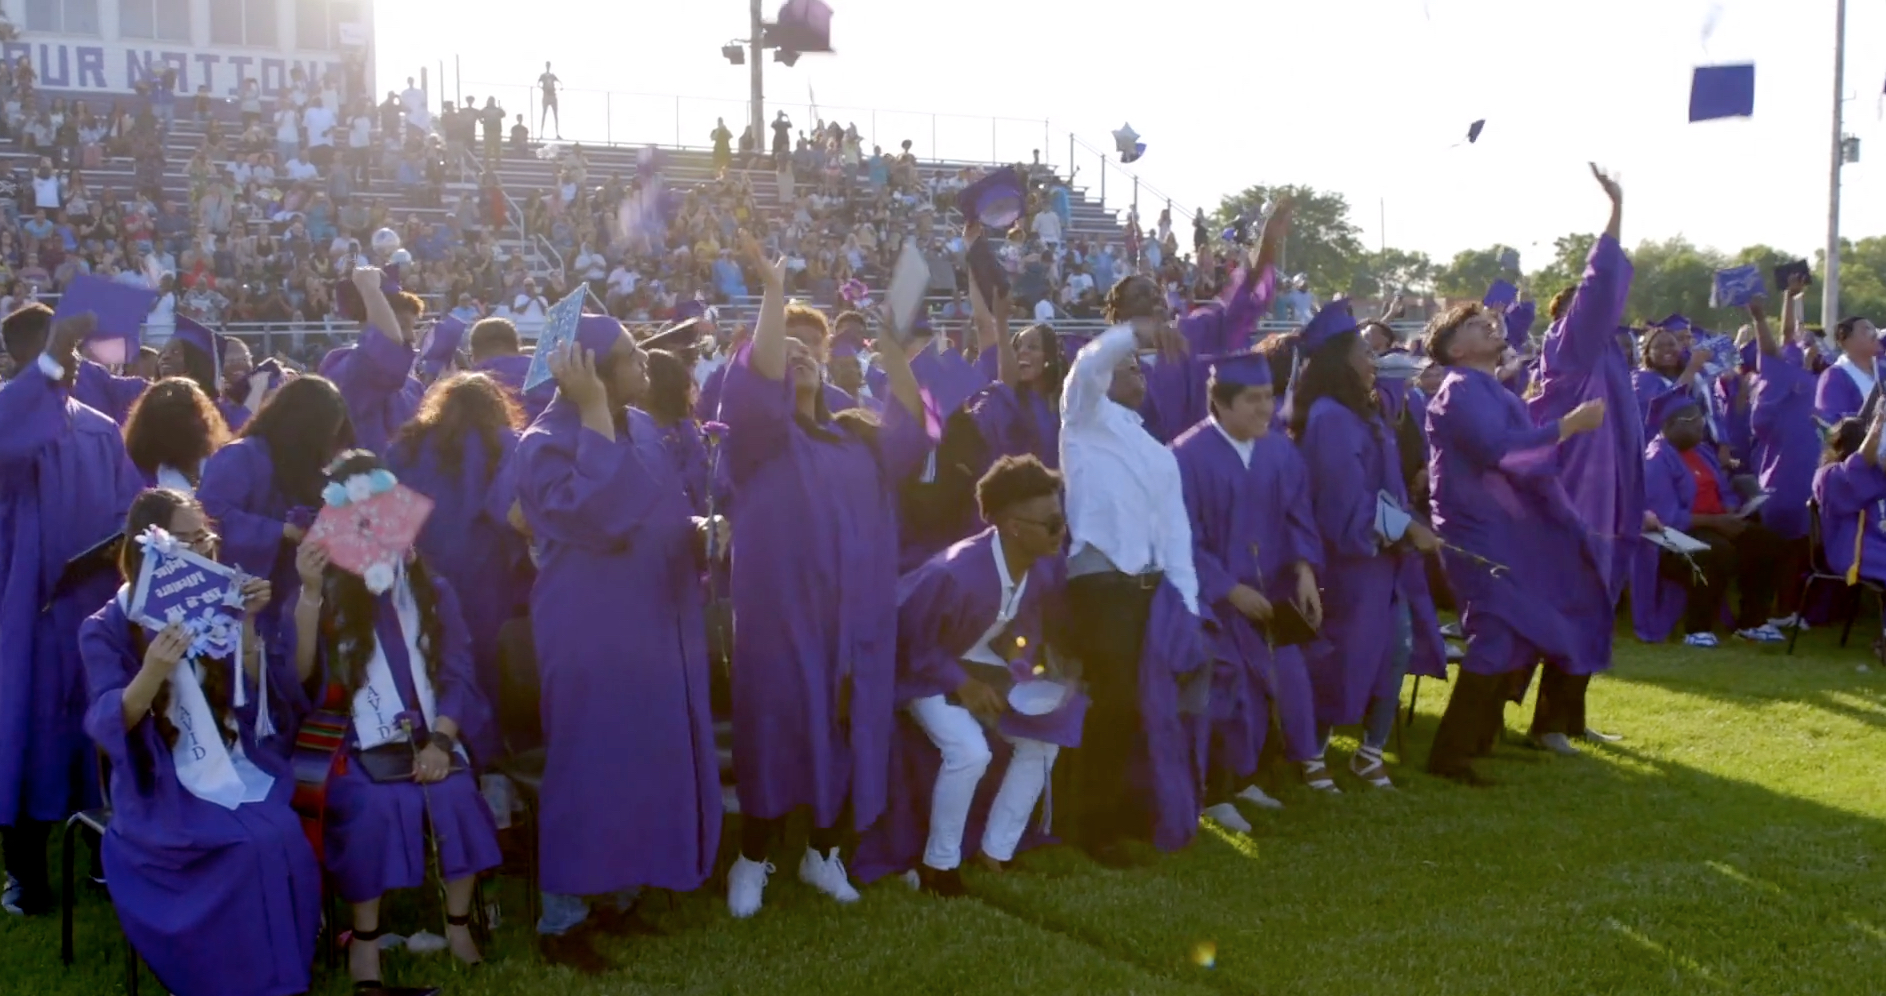 Our Biggest Graduation Season Yet